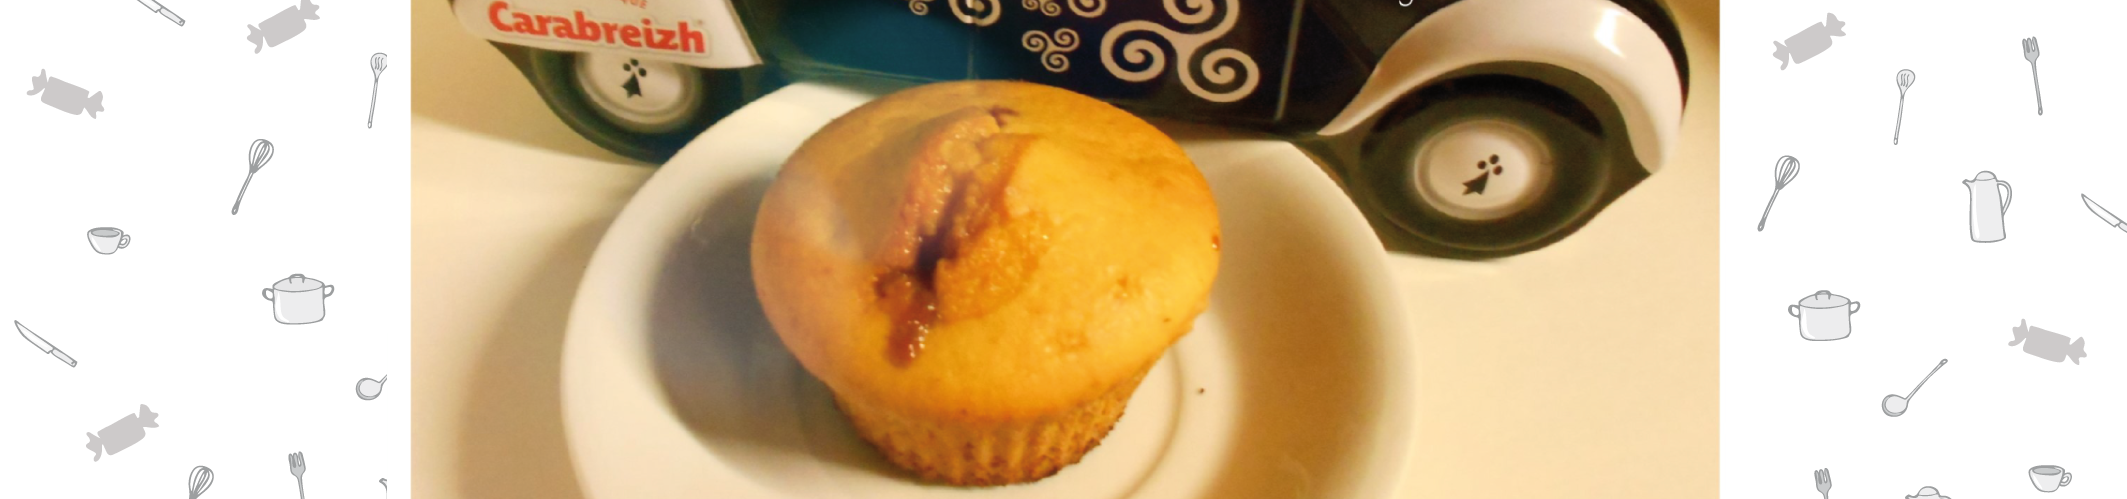 Muffins gourmands aux caramels au beurre salé Carabreizh